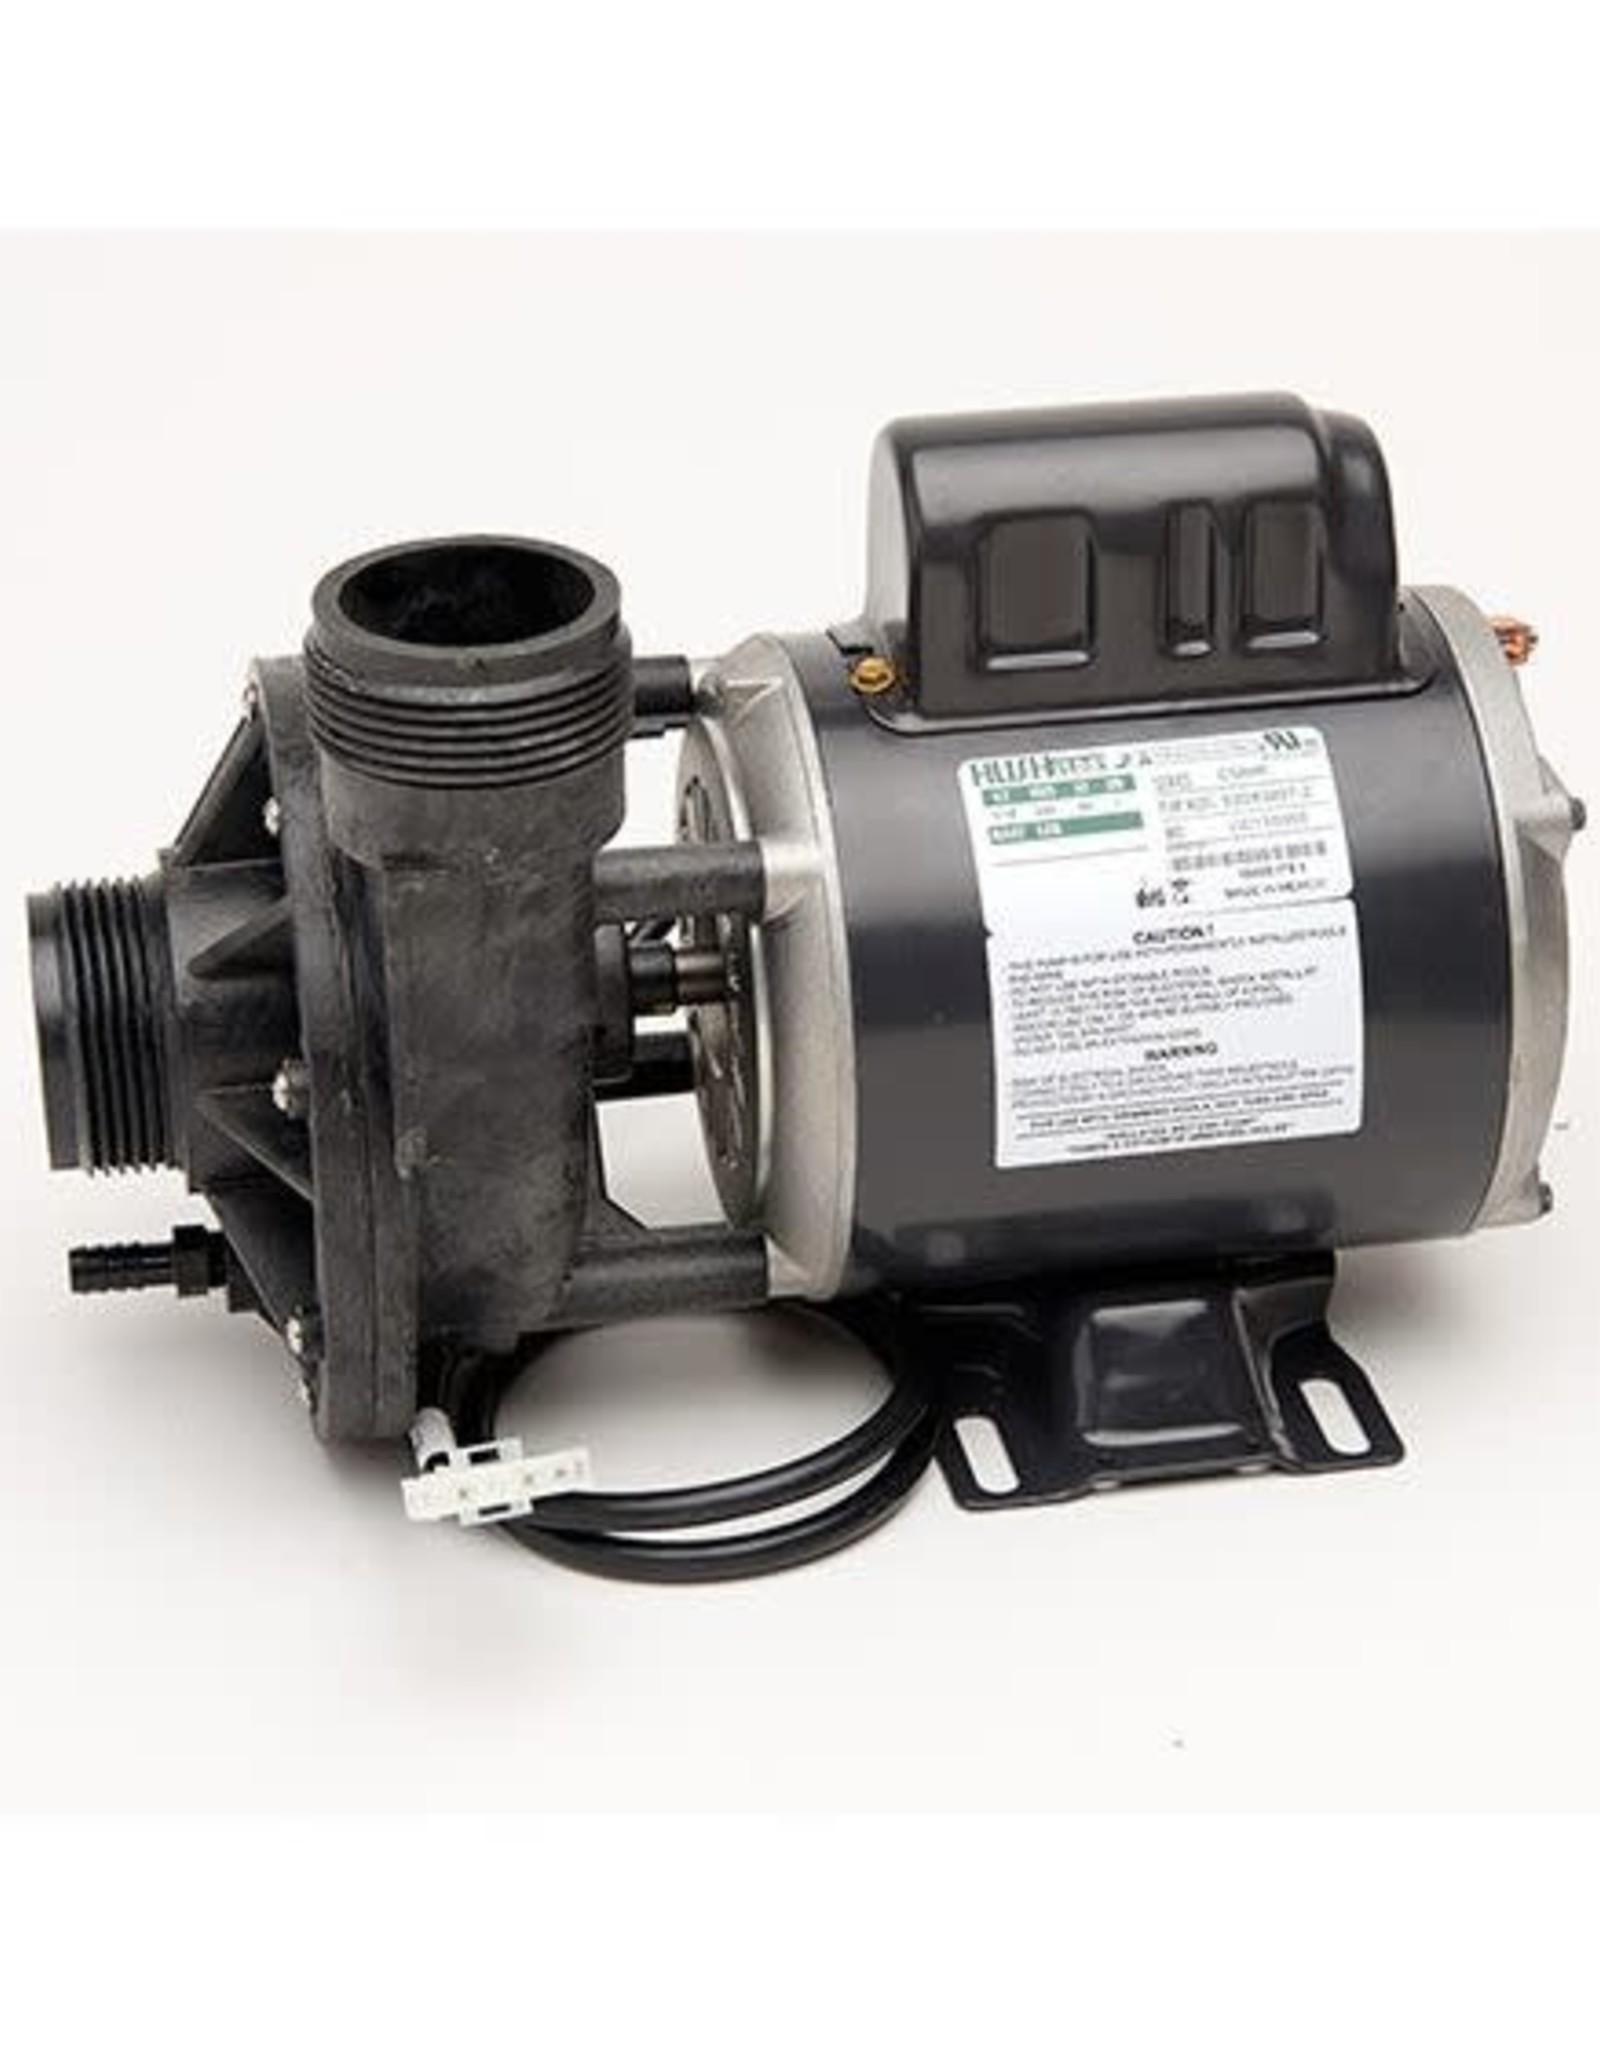 BEACHCOMBER HUSH PUMP 1/15 HP 230V 48F 1.5 X 1.5 W/VITON SEAL